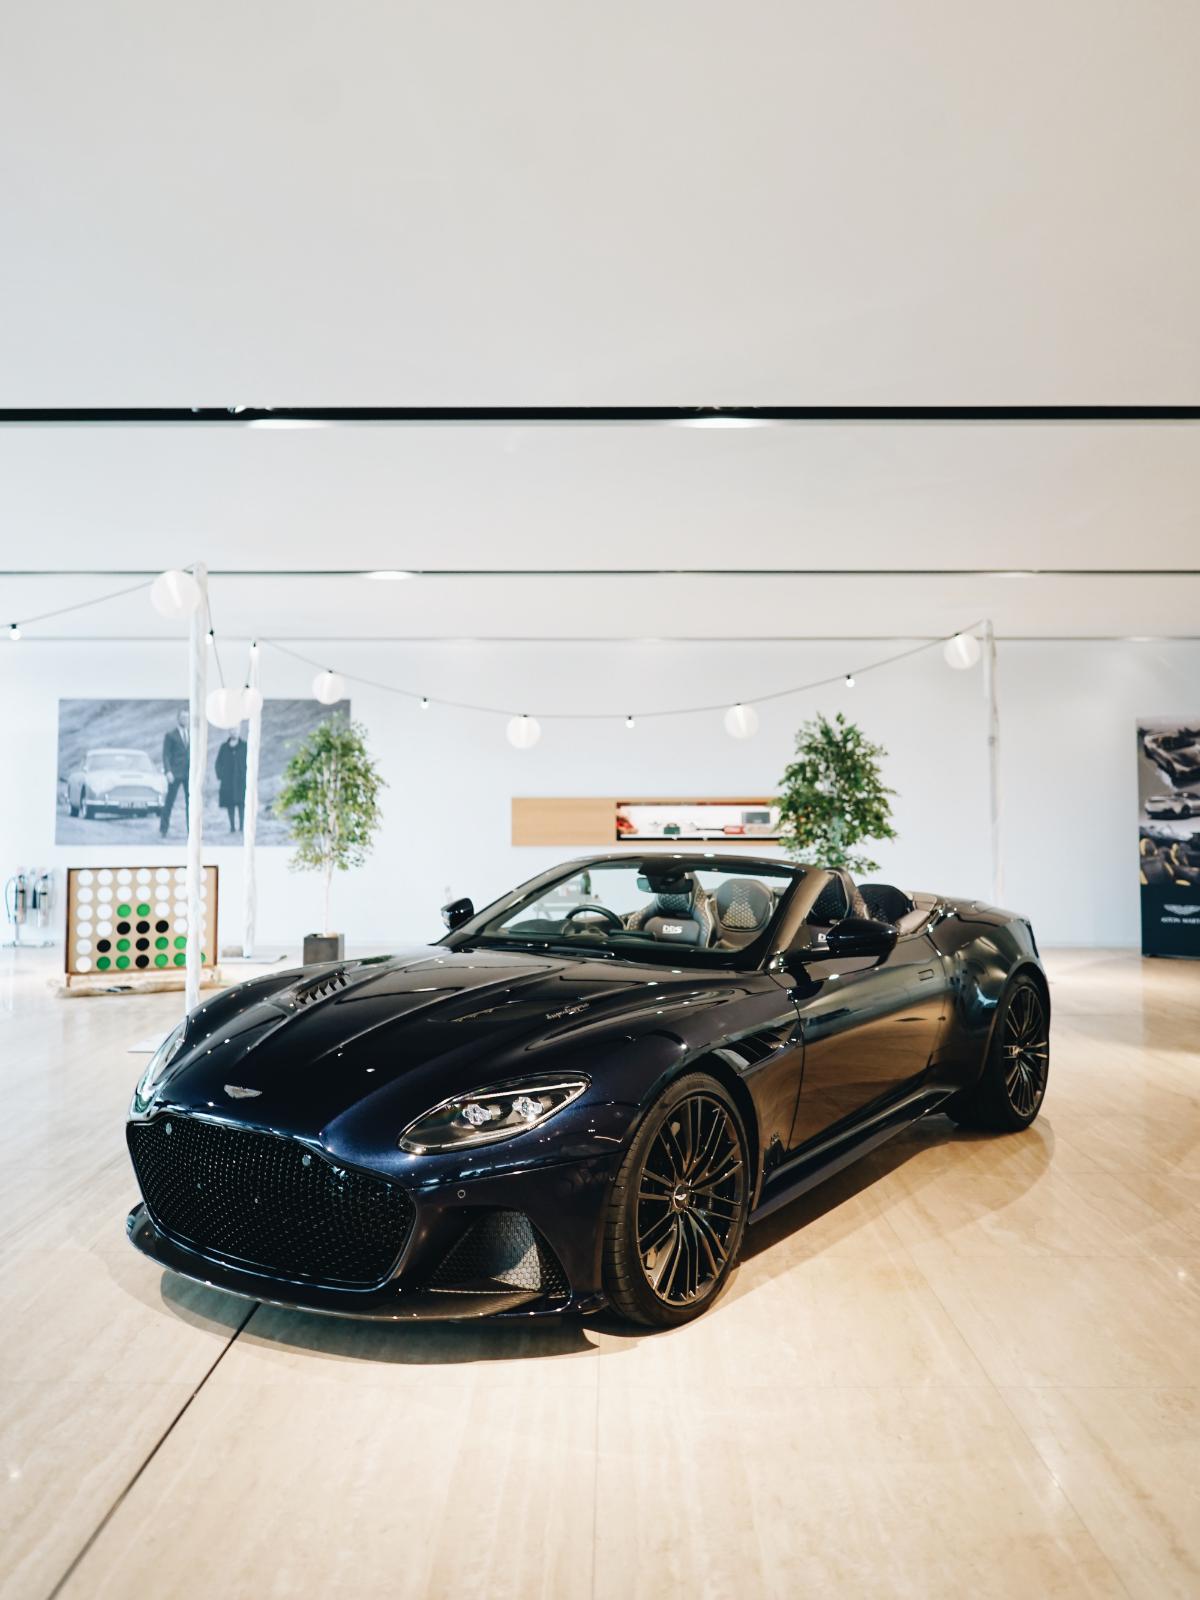 Aston Martin DBS Superleggera Volante Portrait